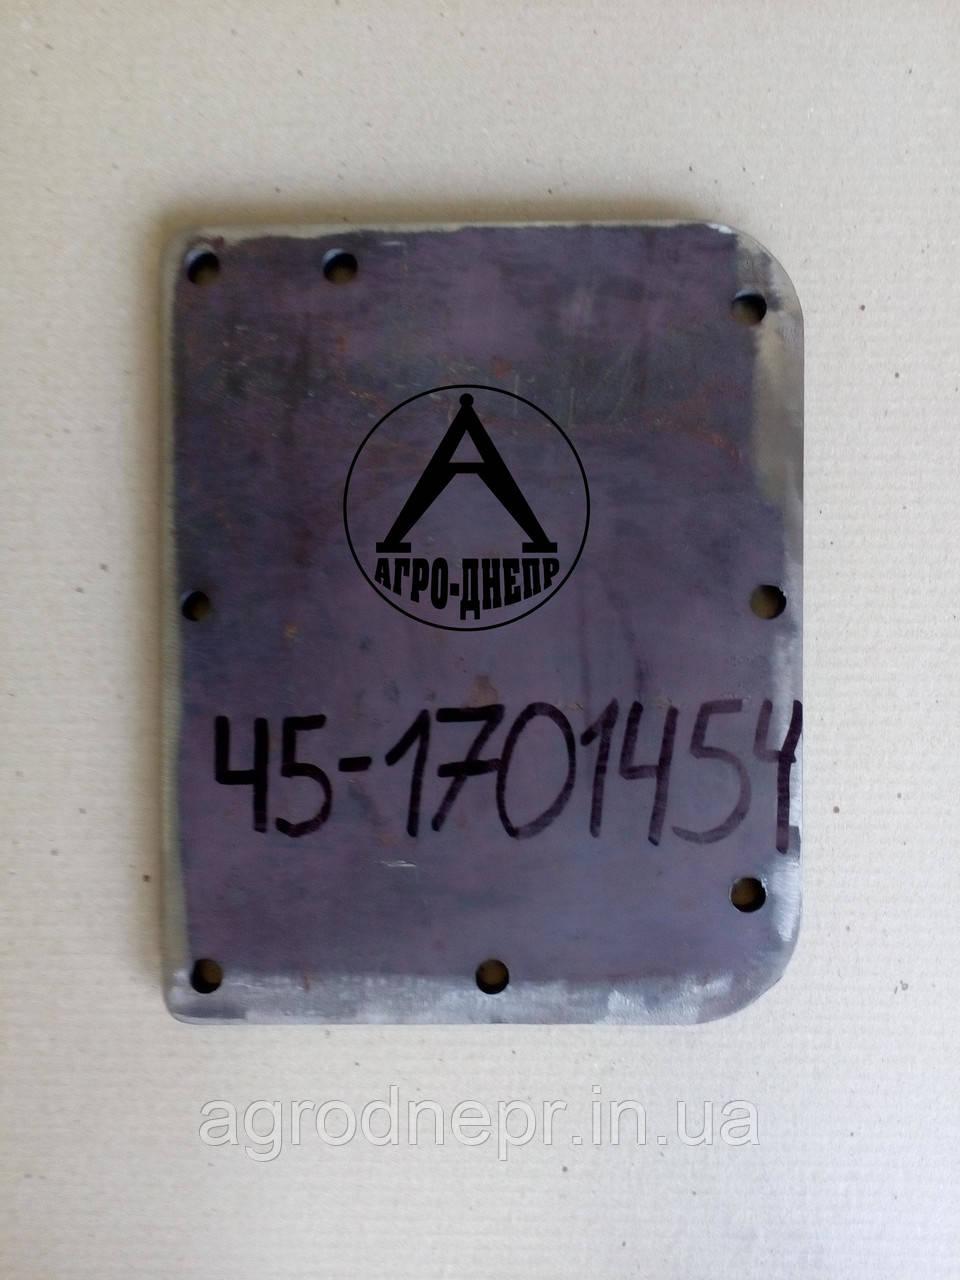 Крышка люка КПП ЮМЗ 45-1701454